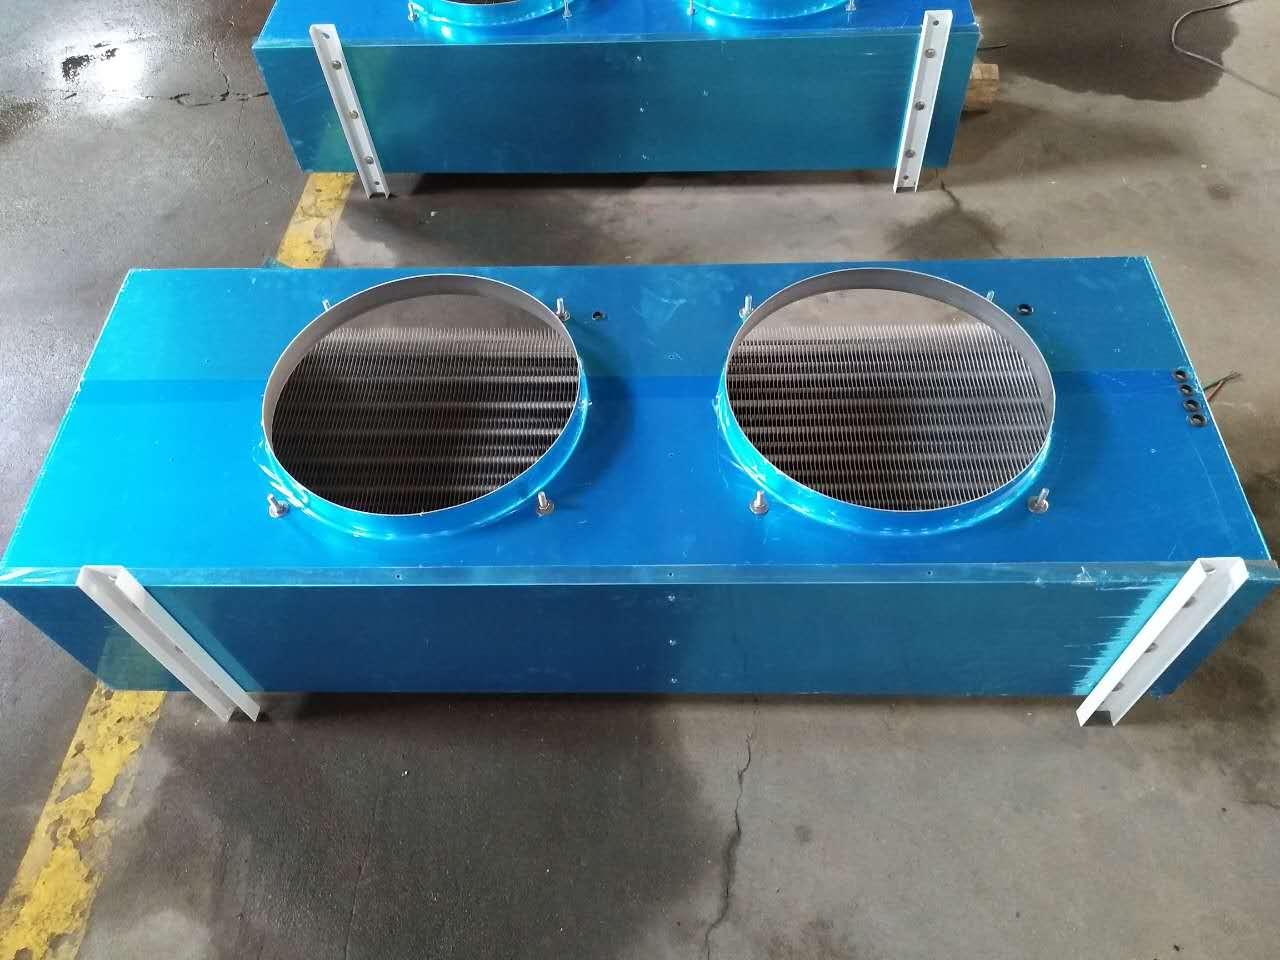 DD80 ψύκτης αέρα σε θερμοκρασία το ανώτατο όριο μπορεί να την παροχή απαιτούνται σχέδια προσαρμοσμένο εξατμιστήρας